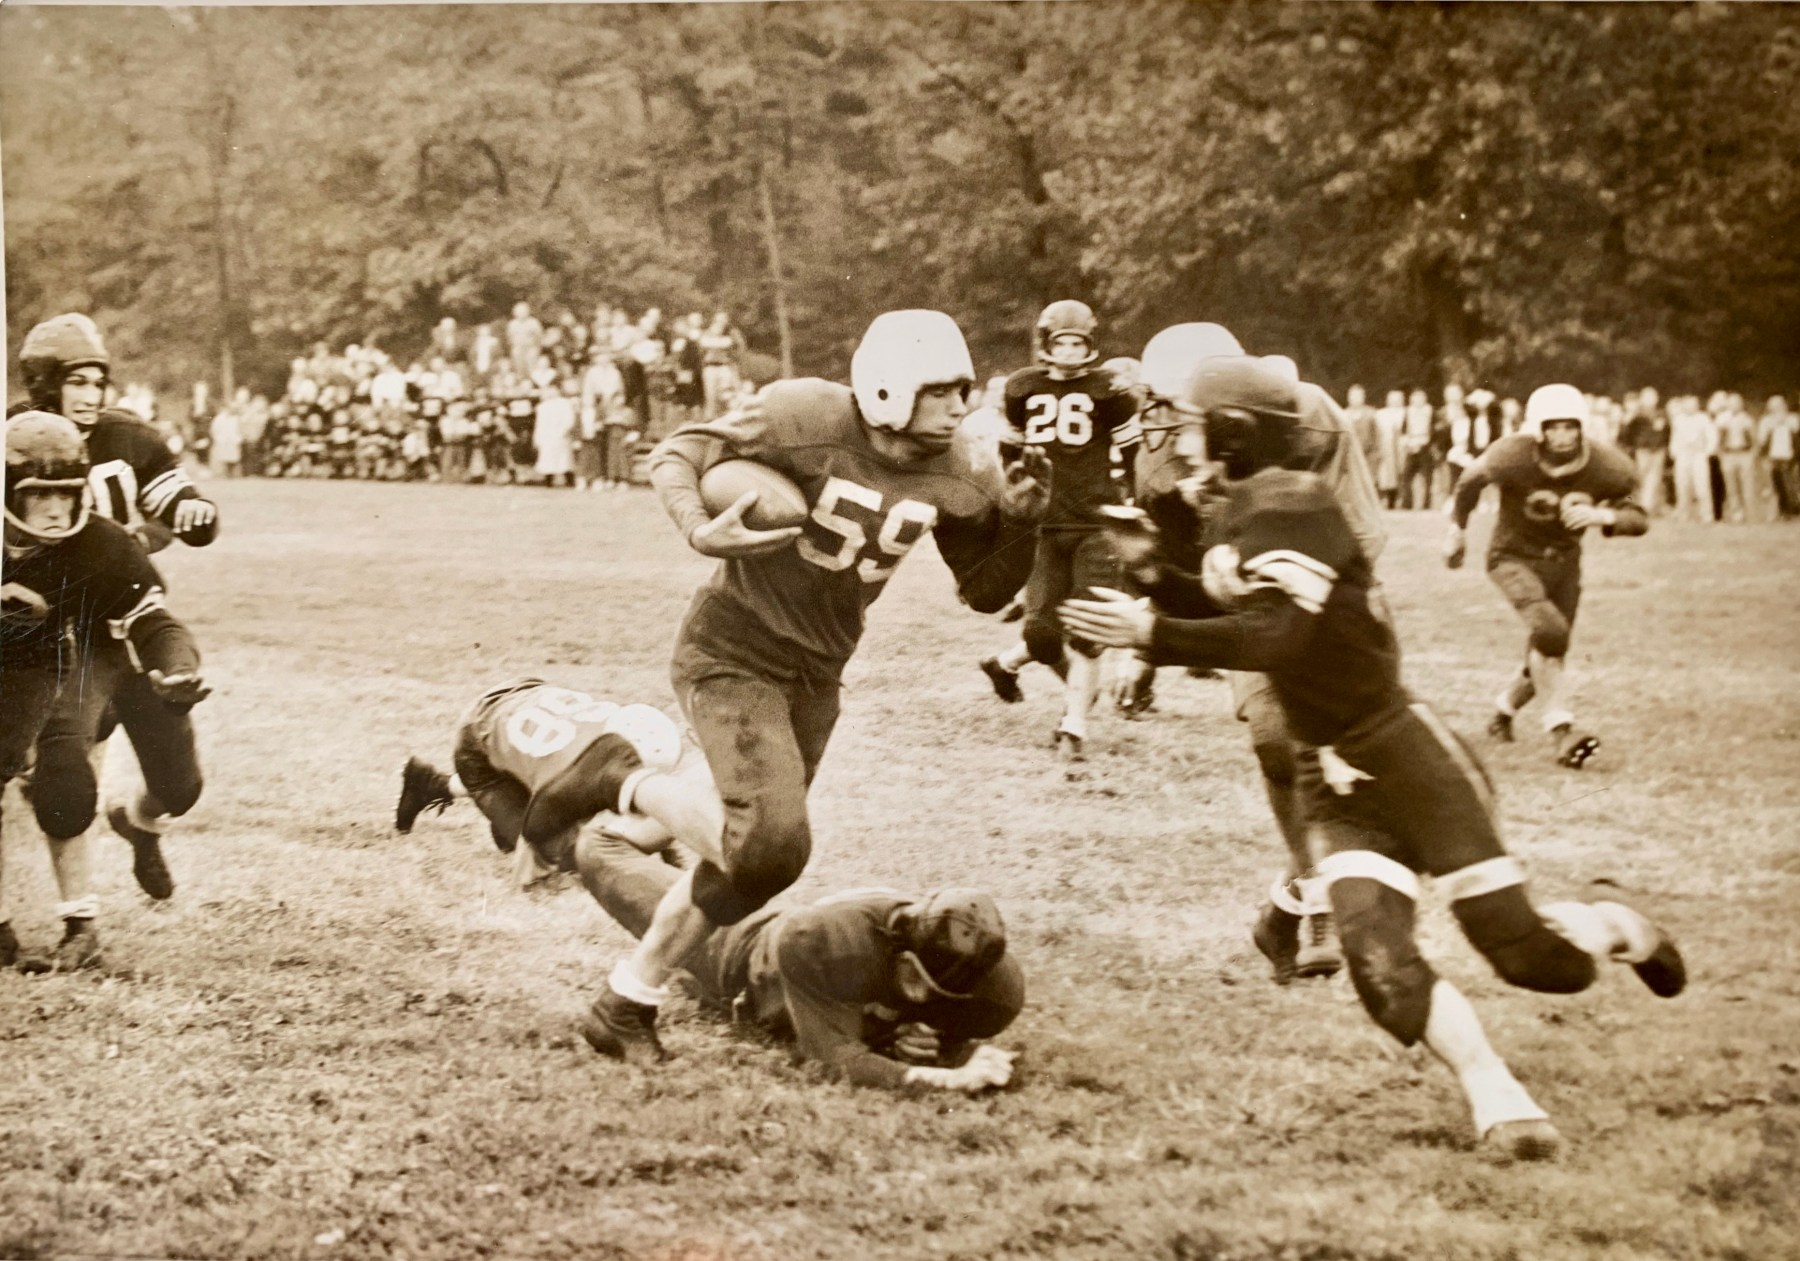 1956 football seasson. Photo credit: Jerry Skelton